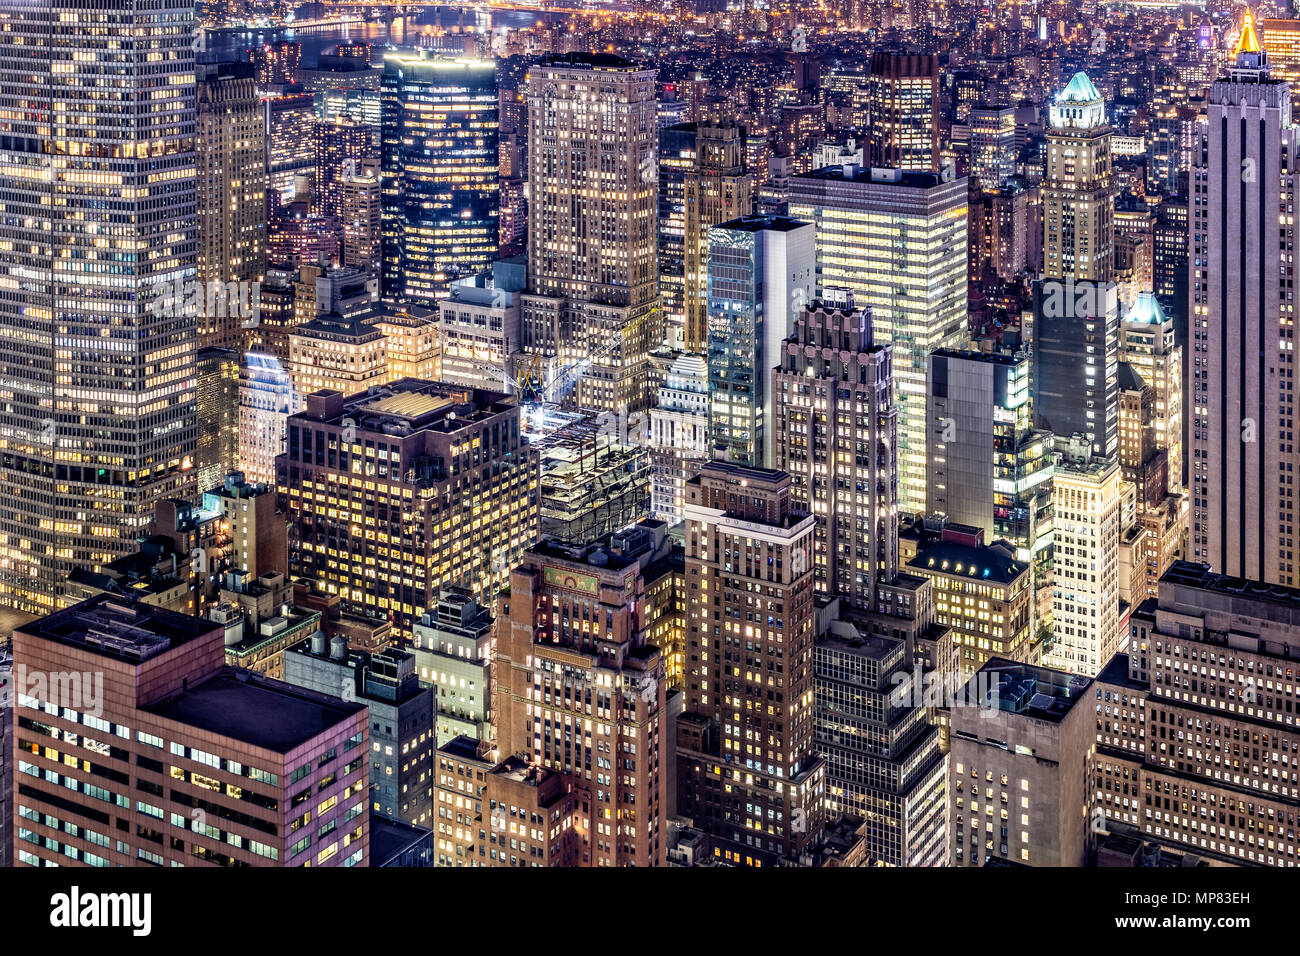 Vista aerea di grattacieli di Manhattan di notte Immagini Stock